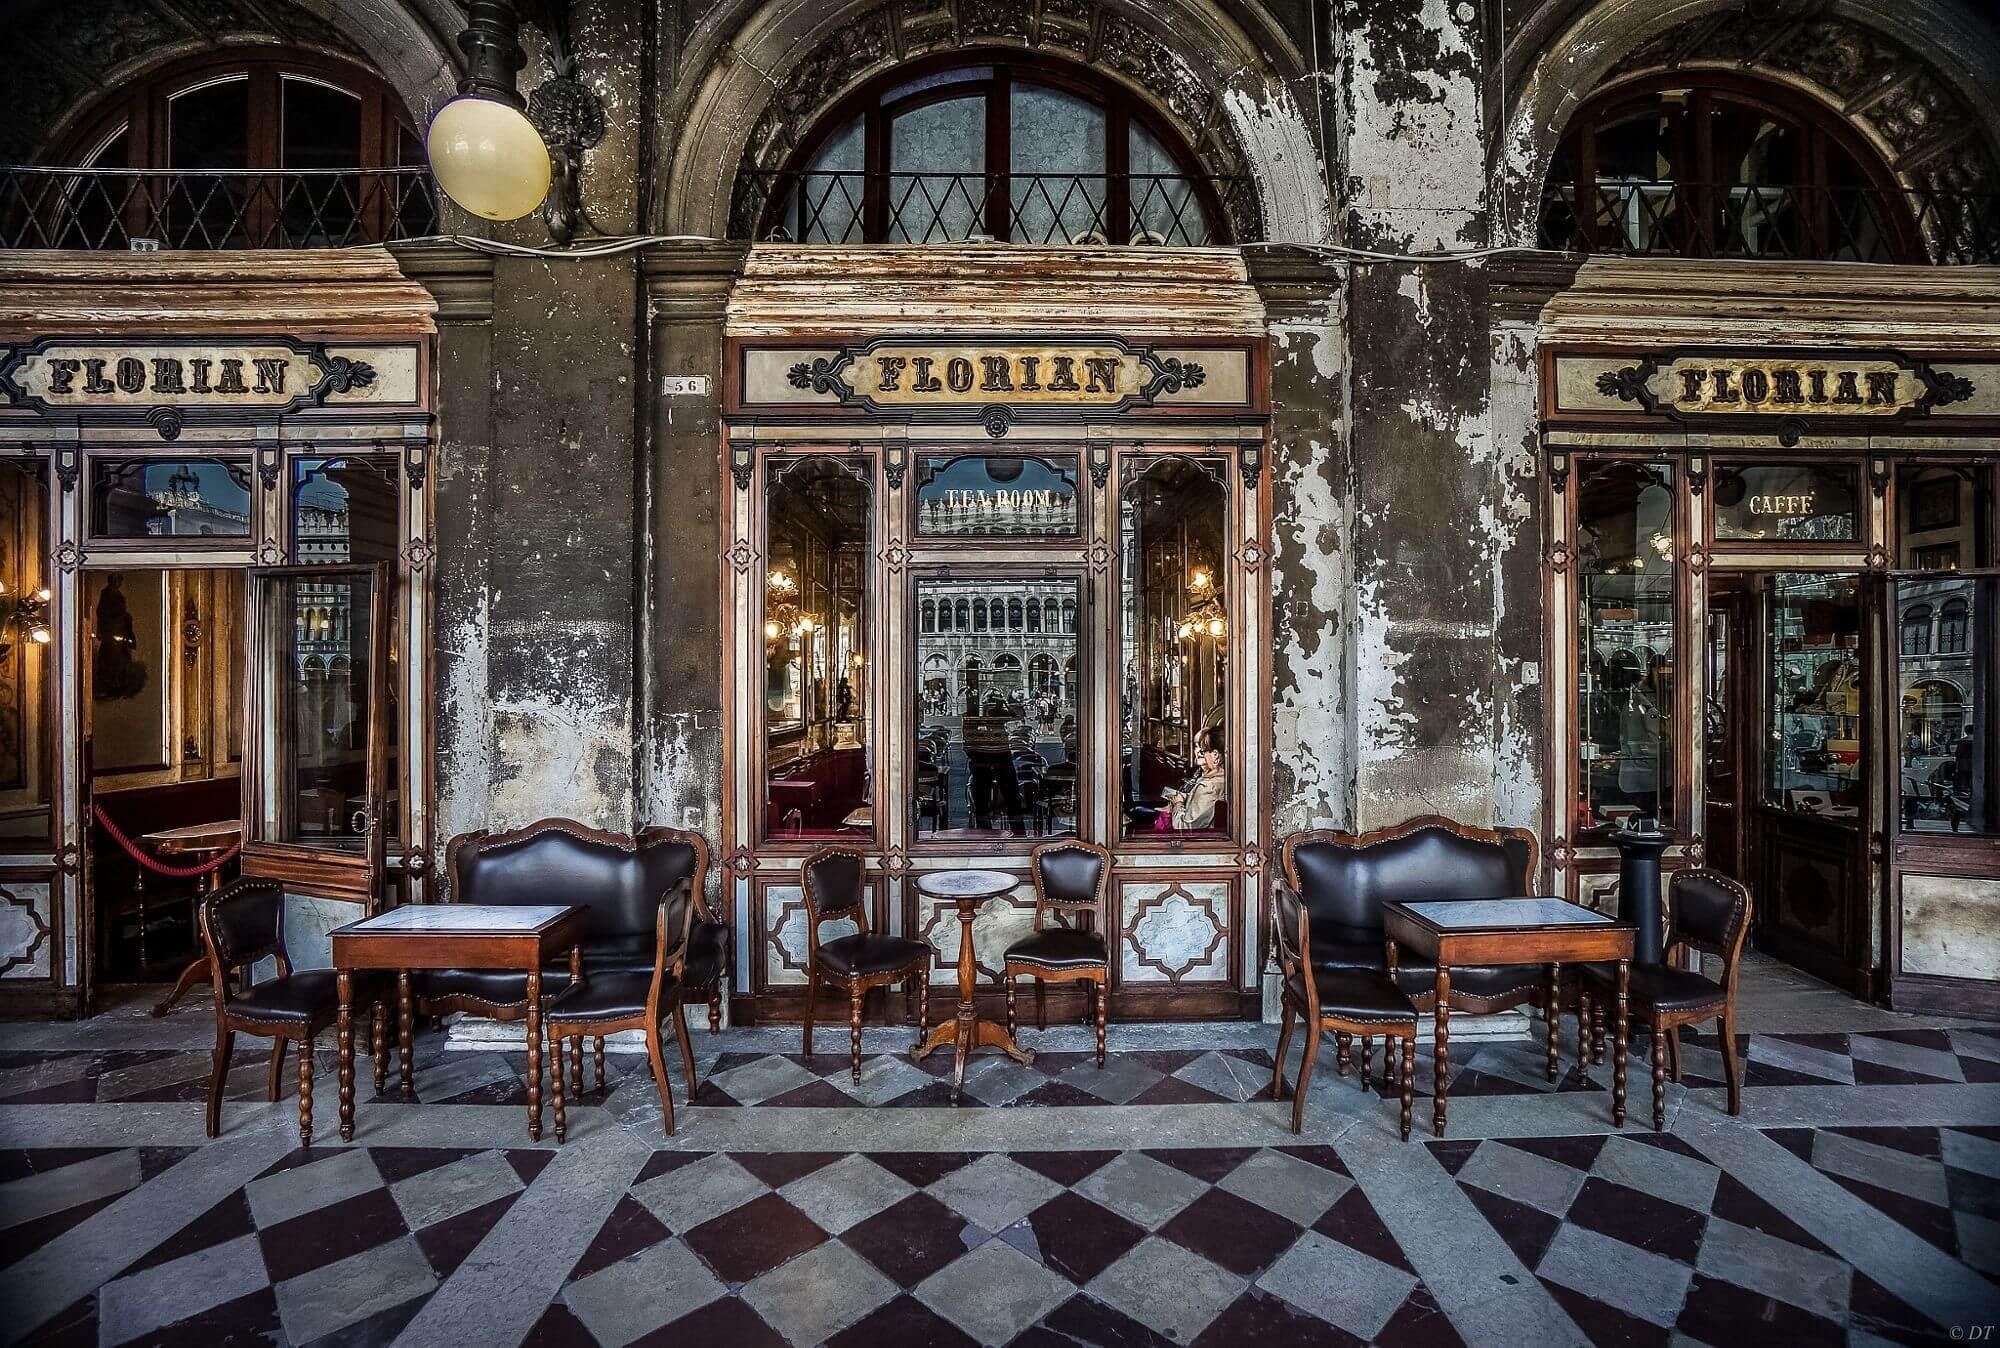 cafe florian venezia CAFFETTERIE PARTICOLARI